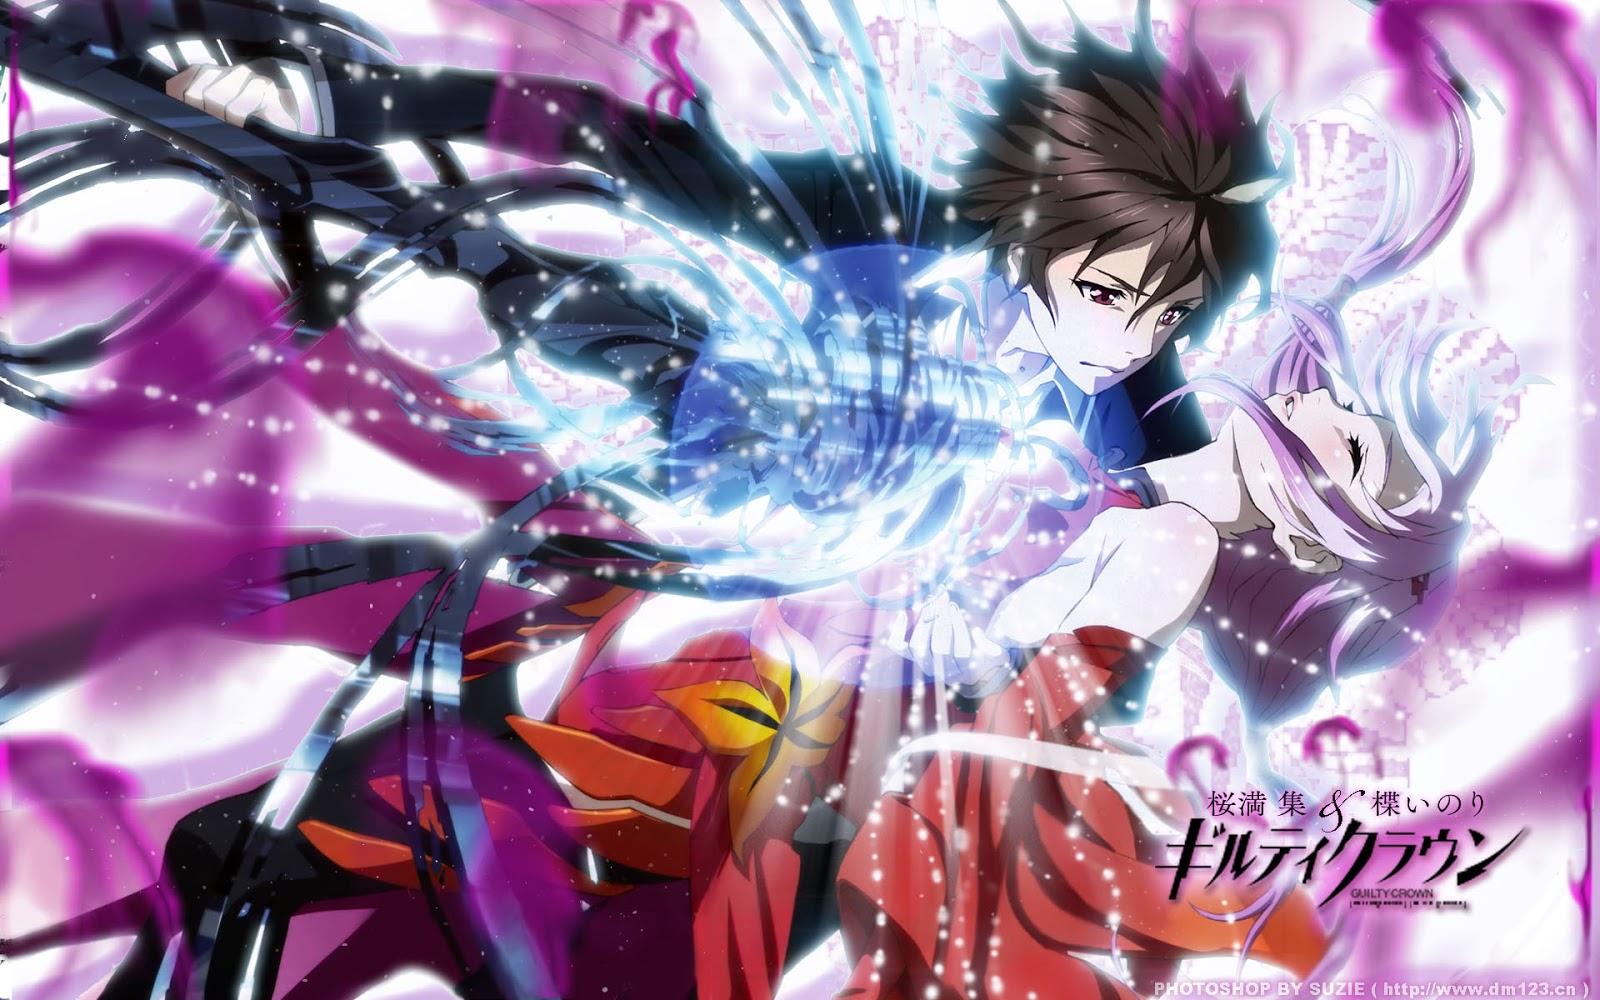 Tapi Tak Bisa Dipungkiri Kalo Animasi Dari Guilty Crown Ini Sangatlah Bagus Cocok Banget Masuk Kategori Anime Action